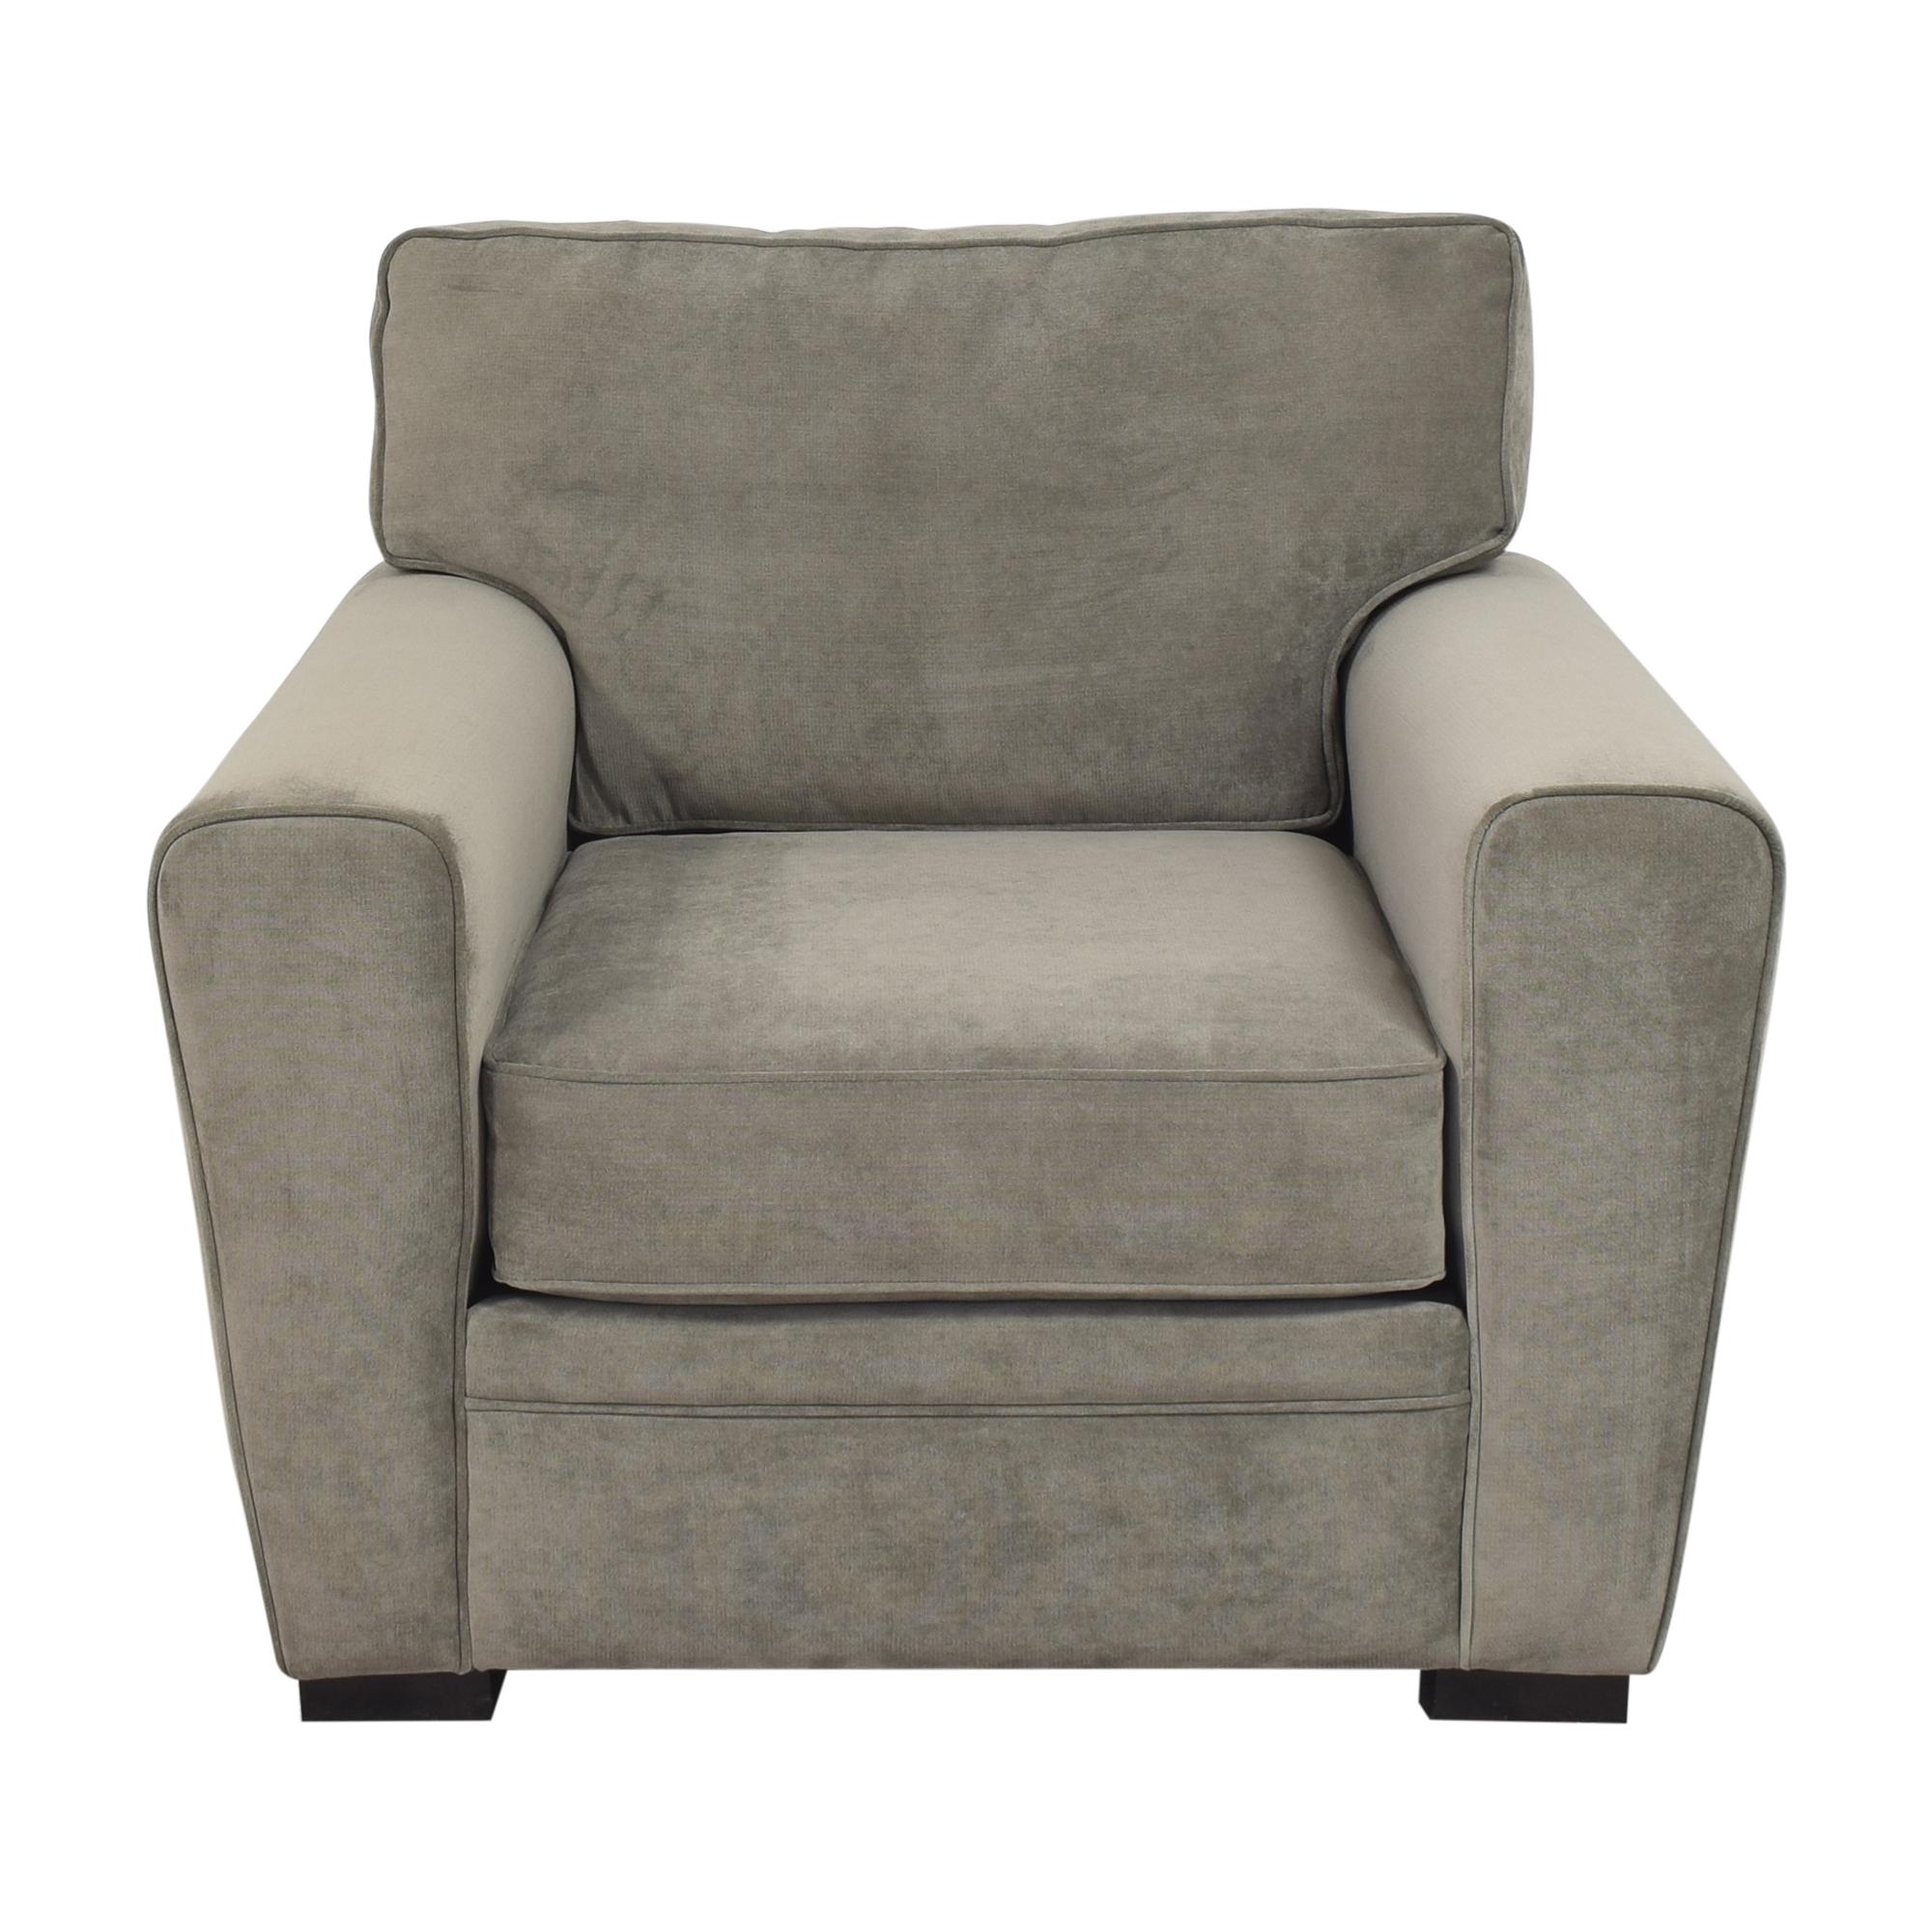 buy Raymour & Flanigan  Artemis II Track Arm Chair Raymour & Flanigan Classic Sofas